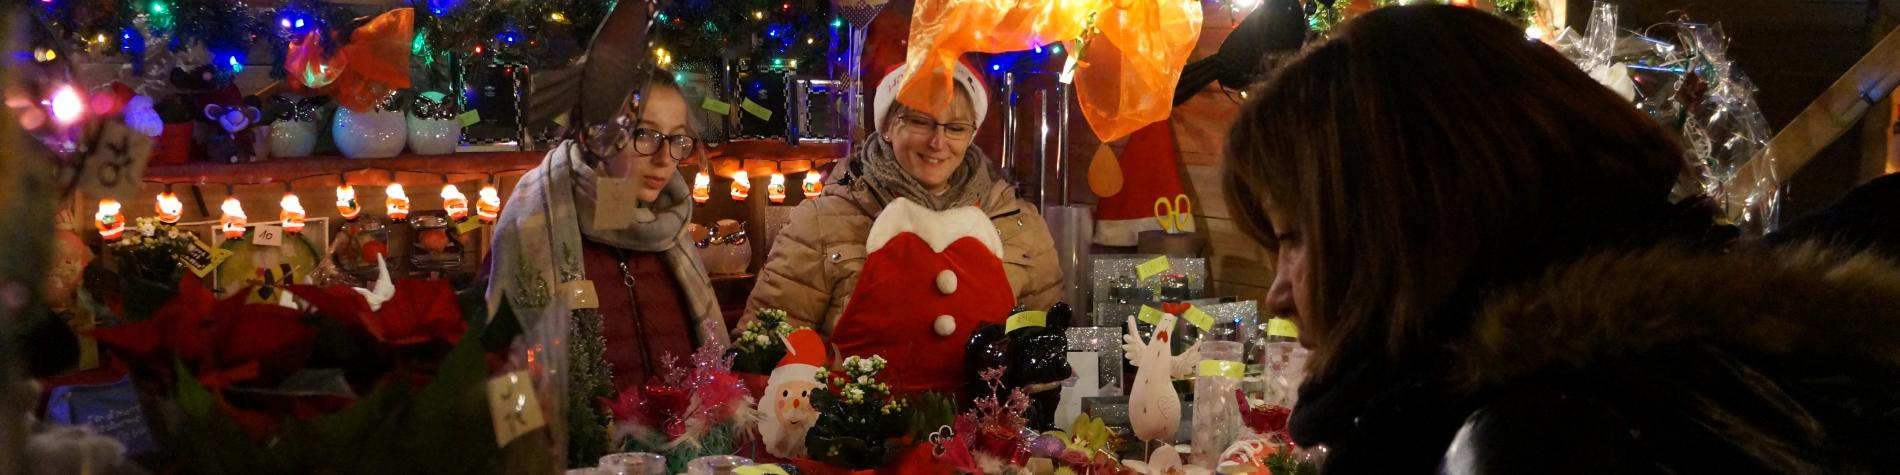 Oupeye's Christmas market